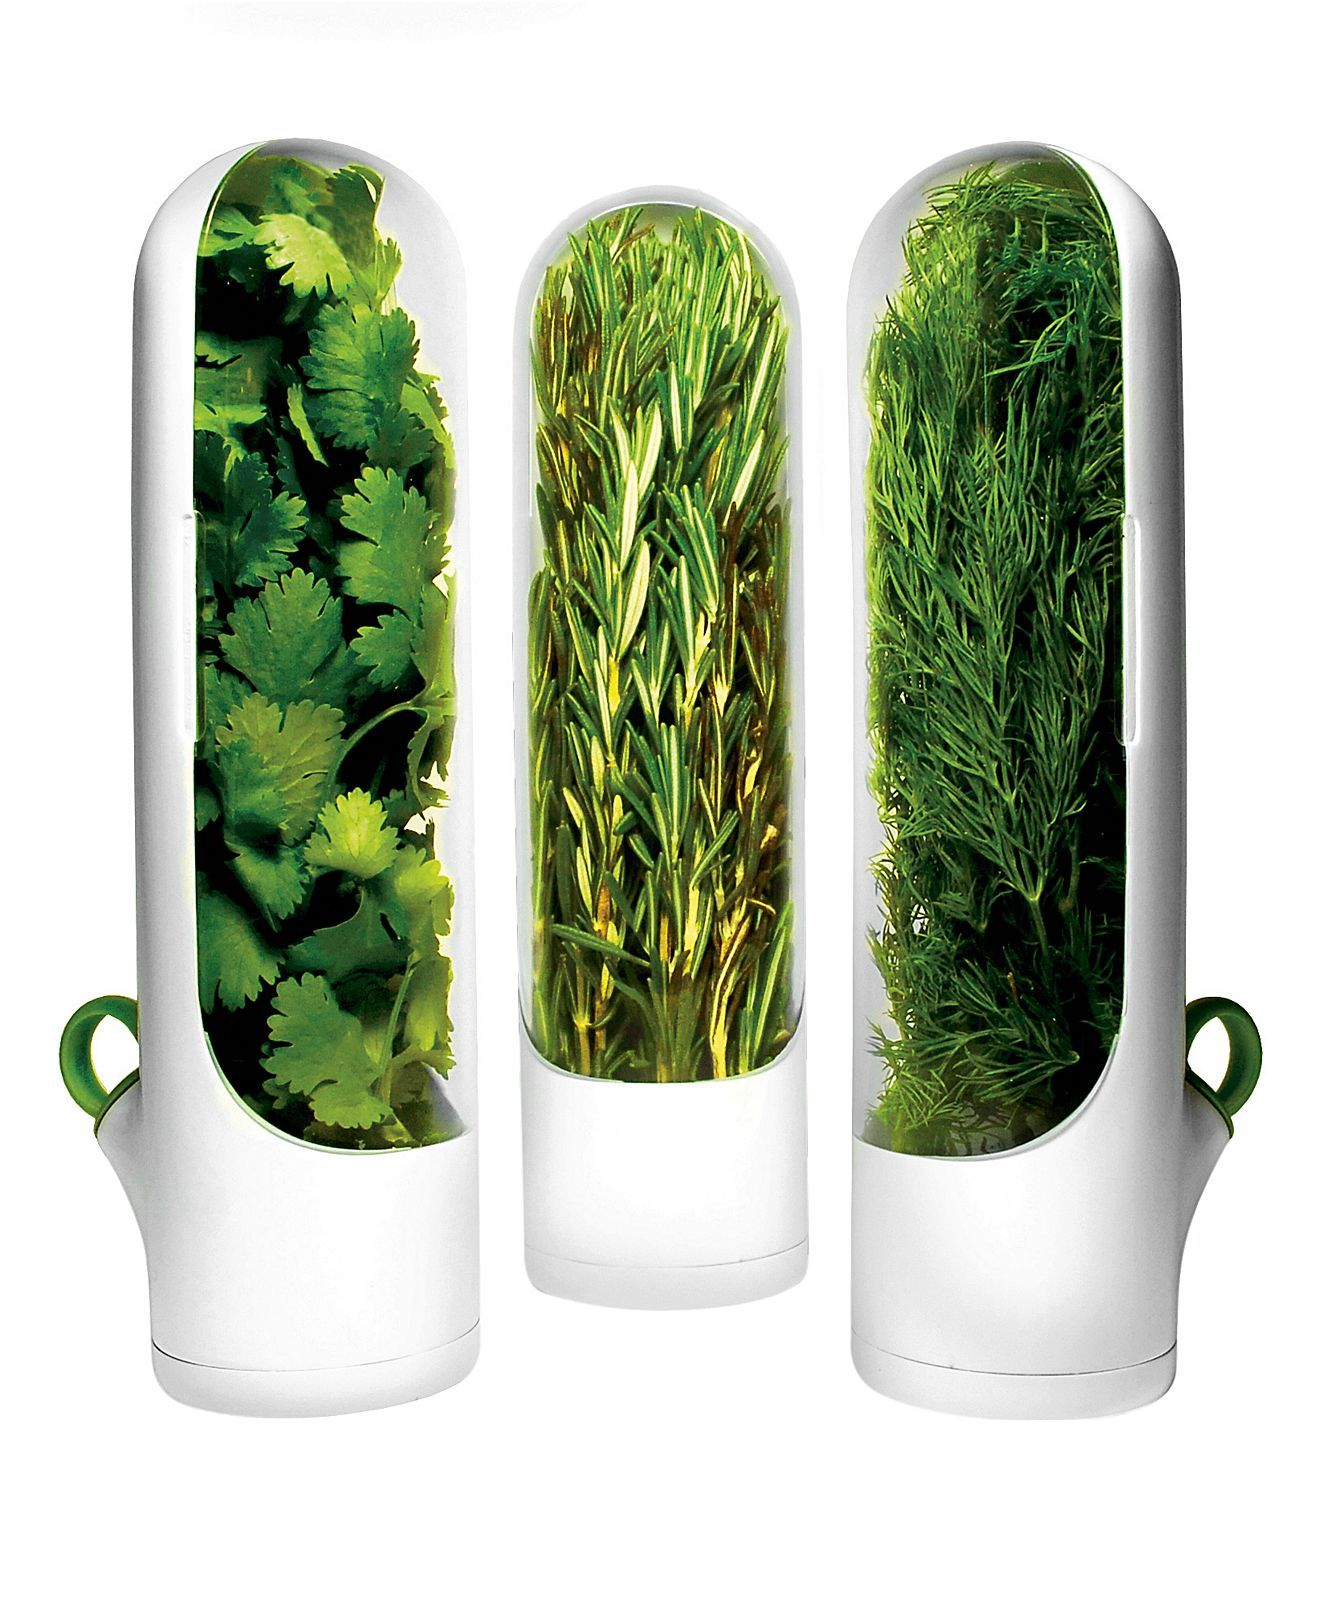 Prepara Herb Containers, Set of 3 Mini Herb Savors at Macy's